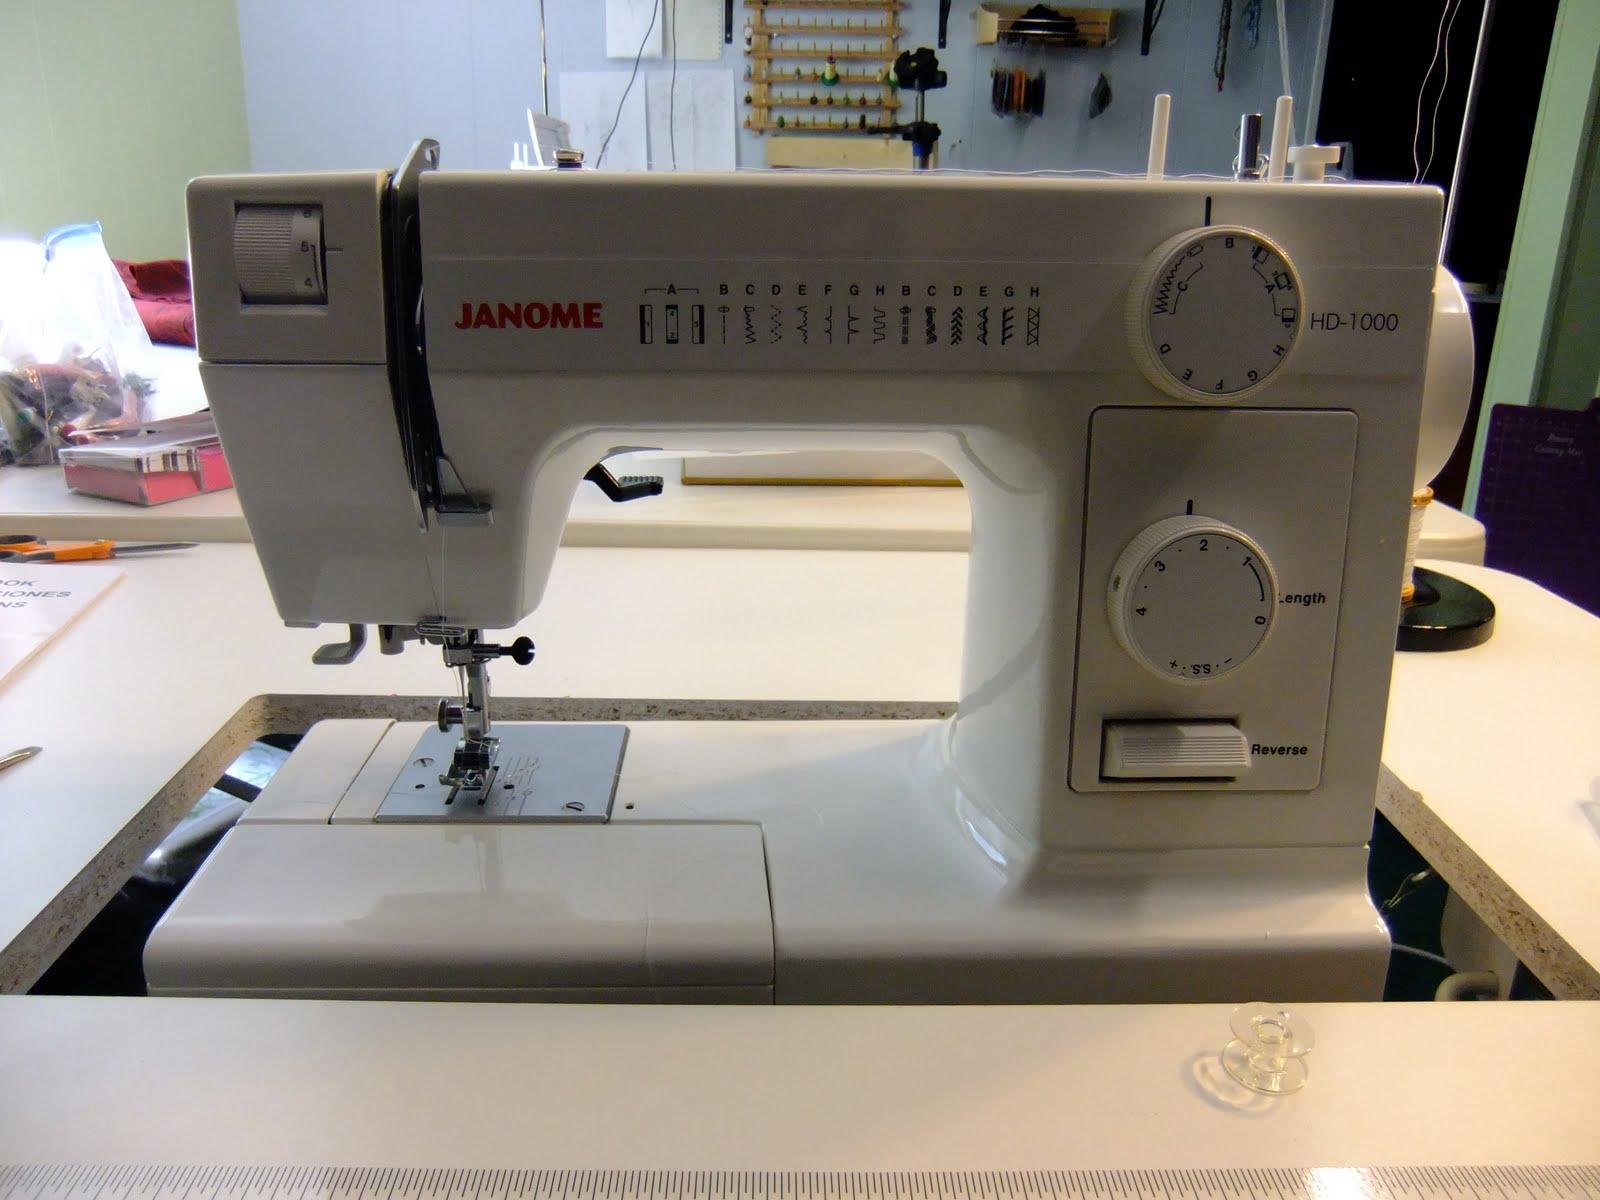 amazon janome mini sew quilting beach machine sewing quilt com